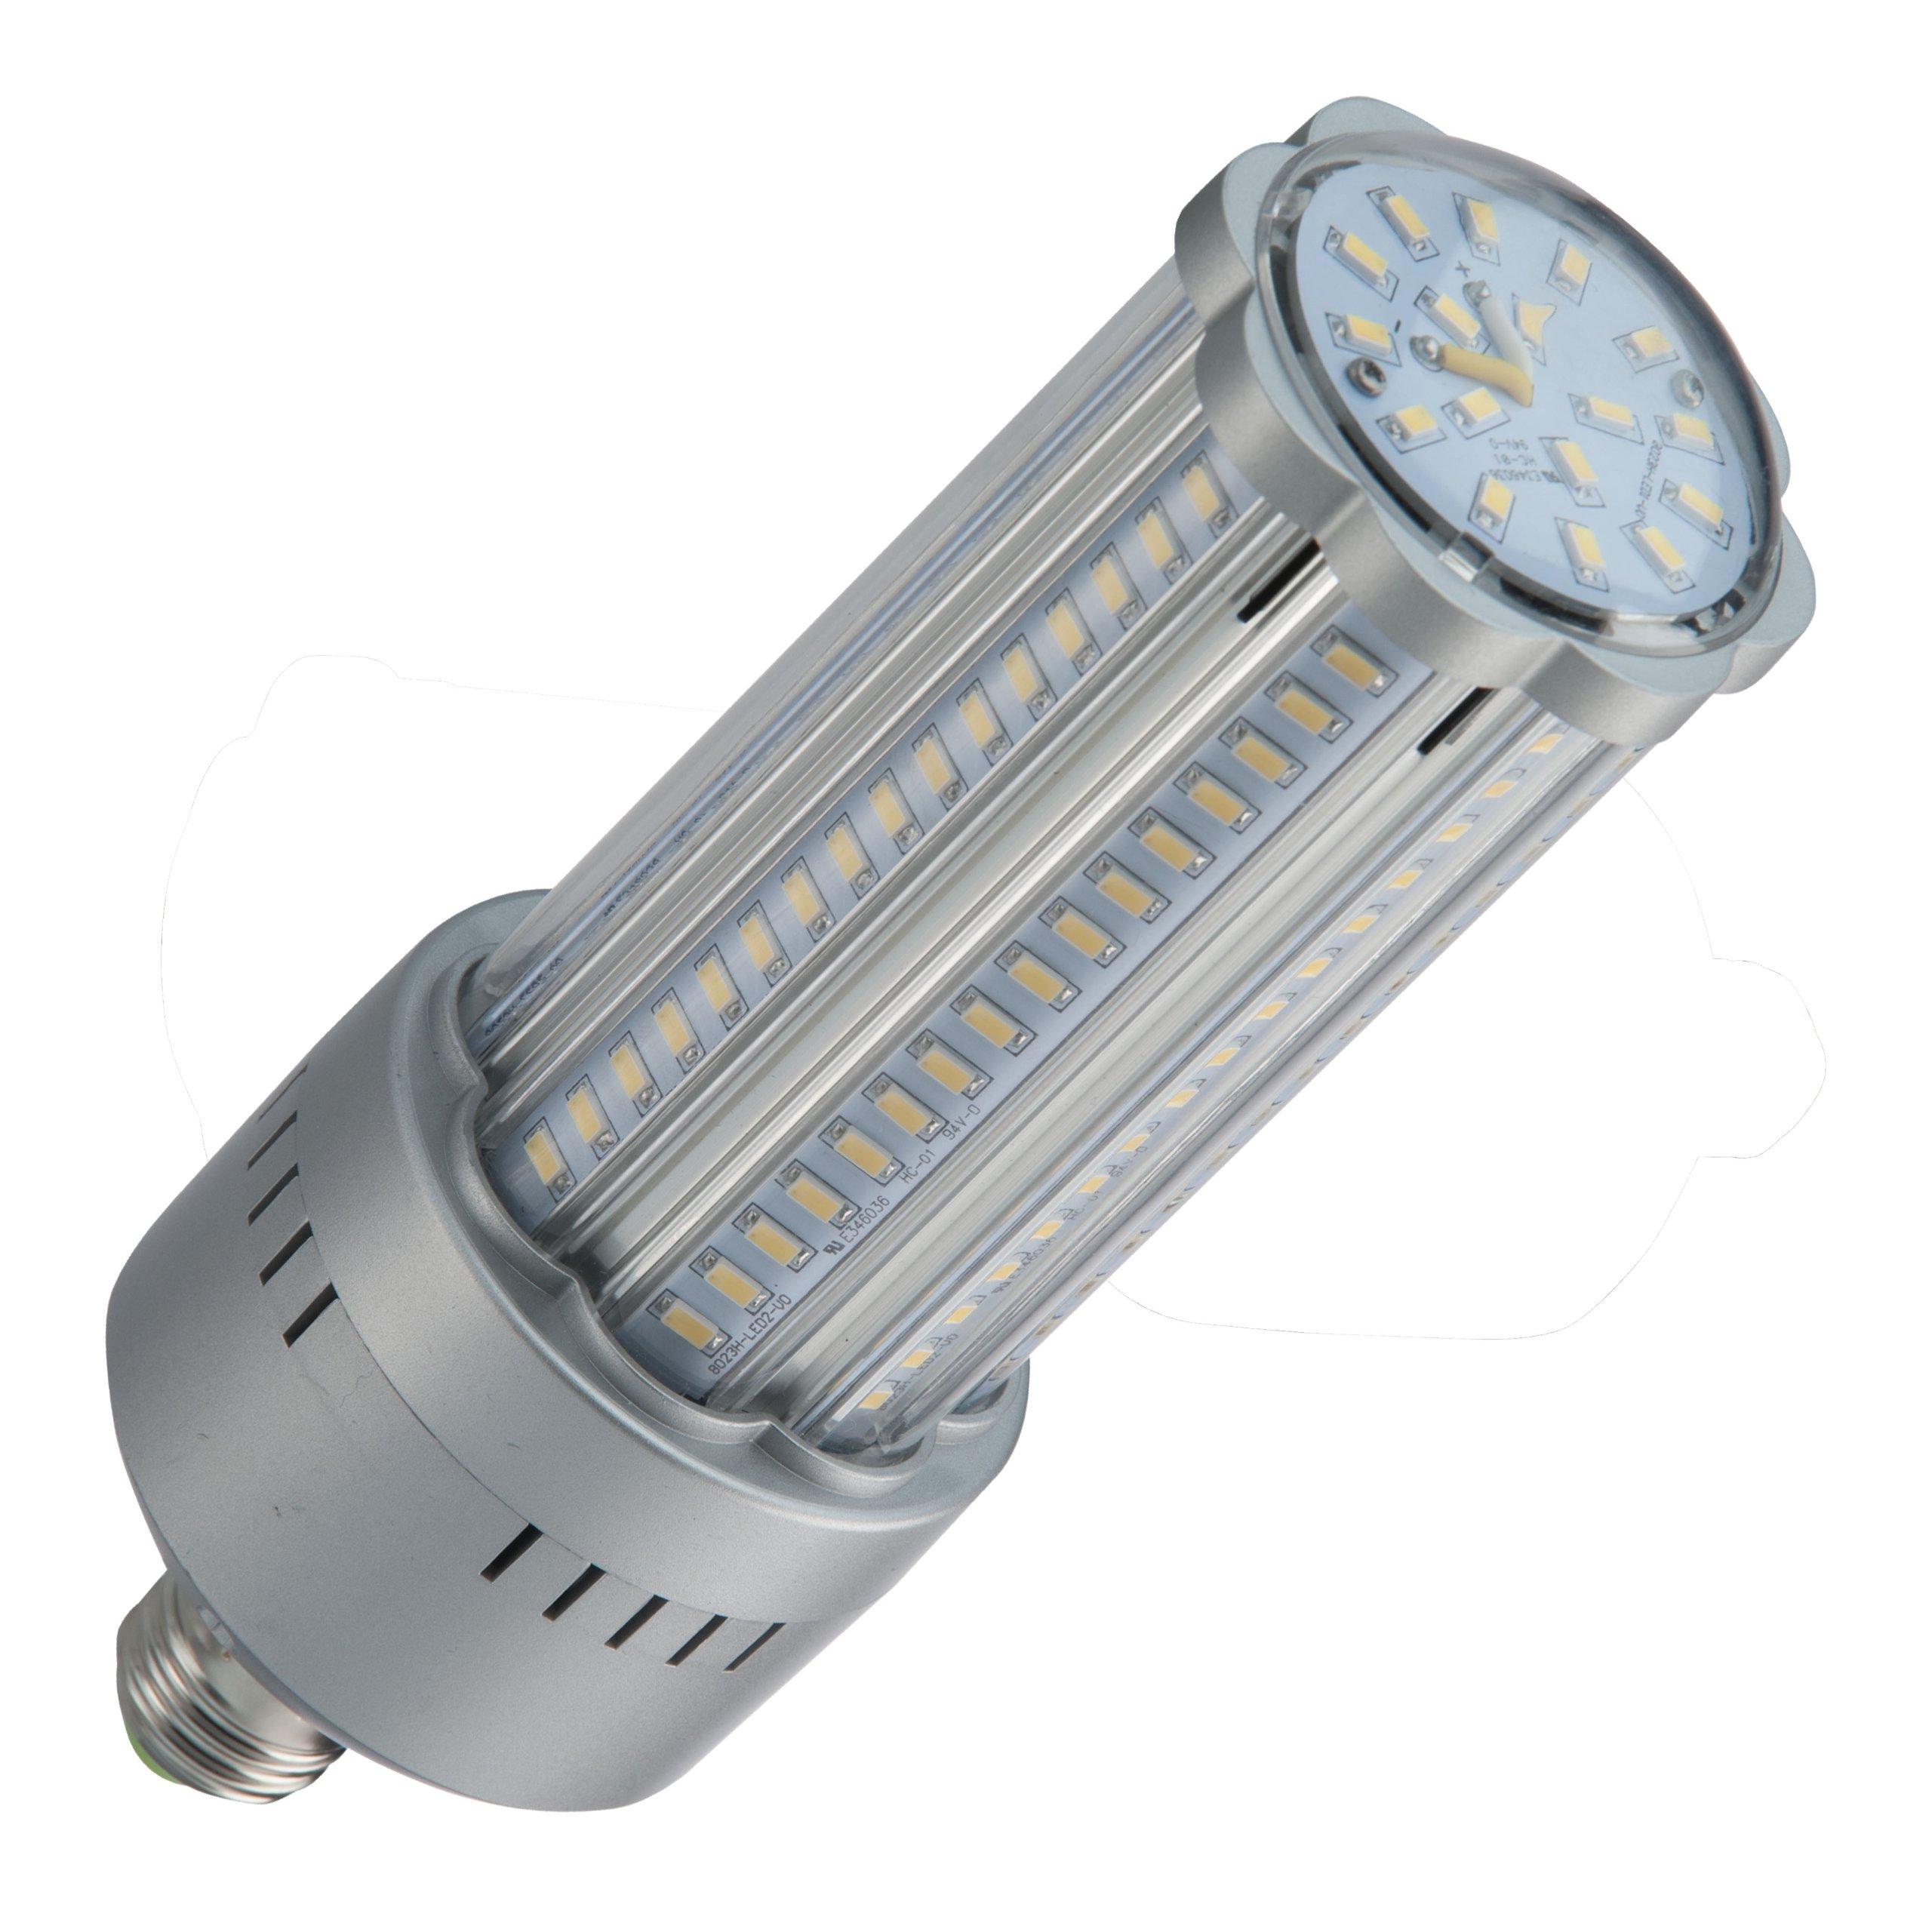 Light Efficient Design LED-8033E57-A Post Top/Site Lighting Retrofit LED Light Bulb, 5700 Kelvins, Day White